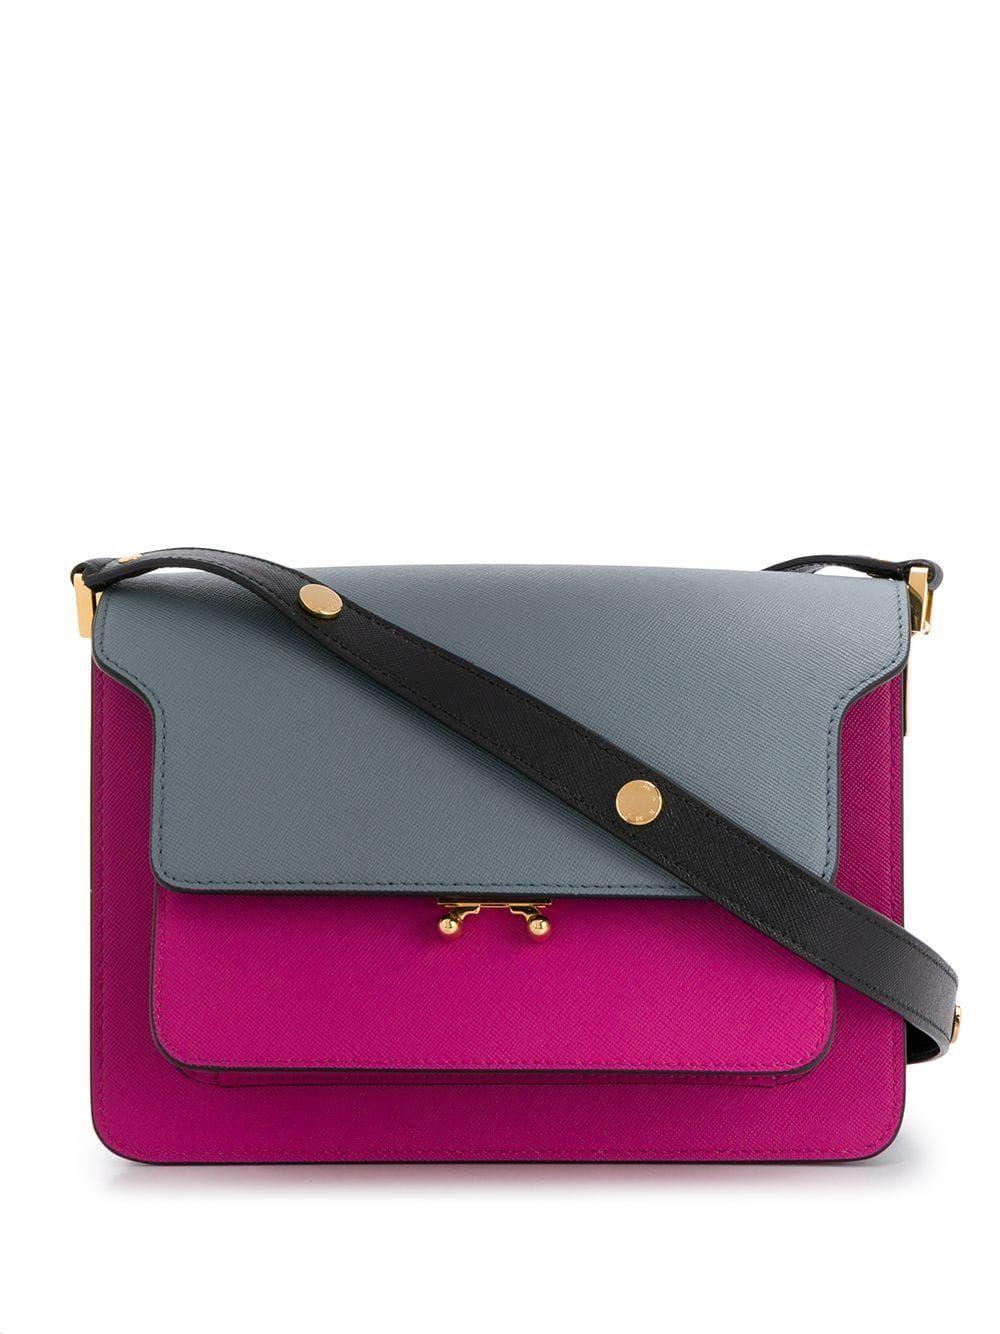 MARNI WOMEN'S SBMPN09U45LV520Z254N PURPLE LEATHER SHOULDER BAG